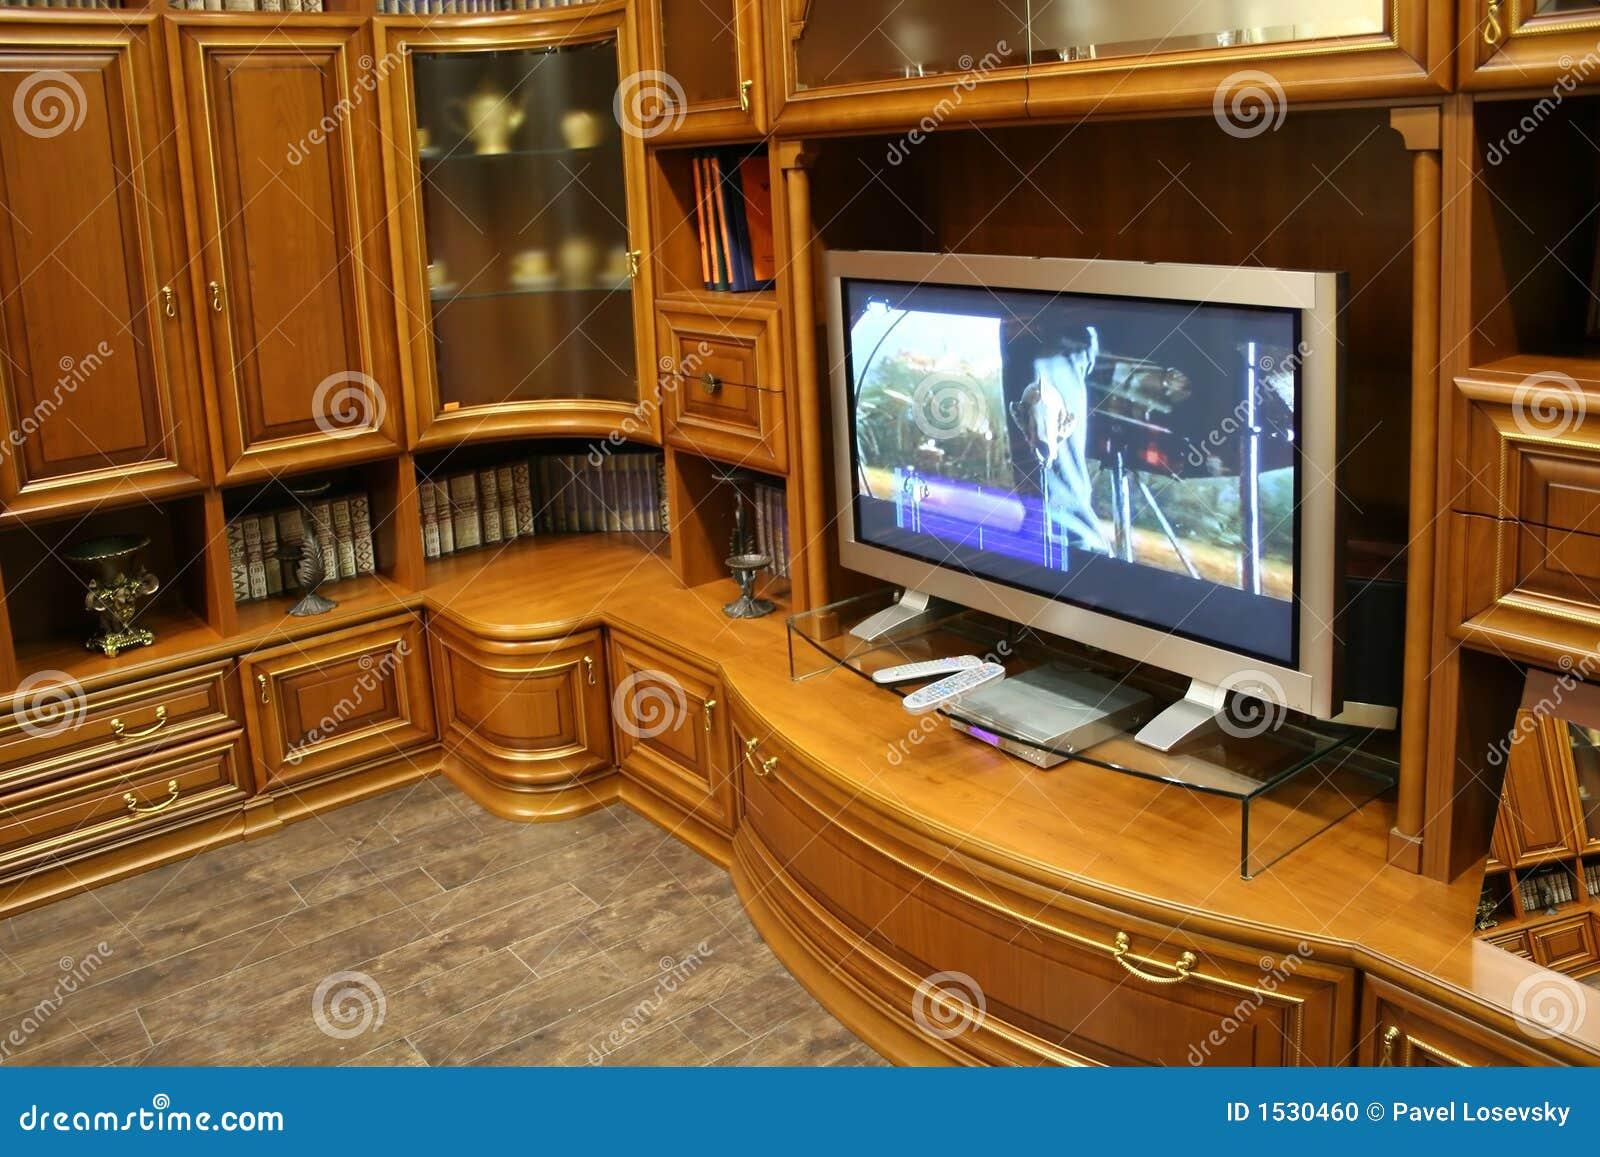 Muebles de la tv y de la pared foto de archivo imagen for Muebles de pared